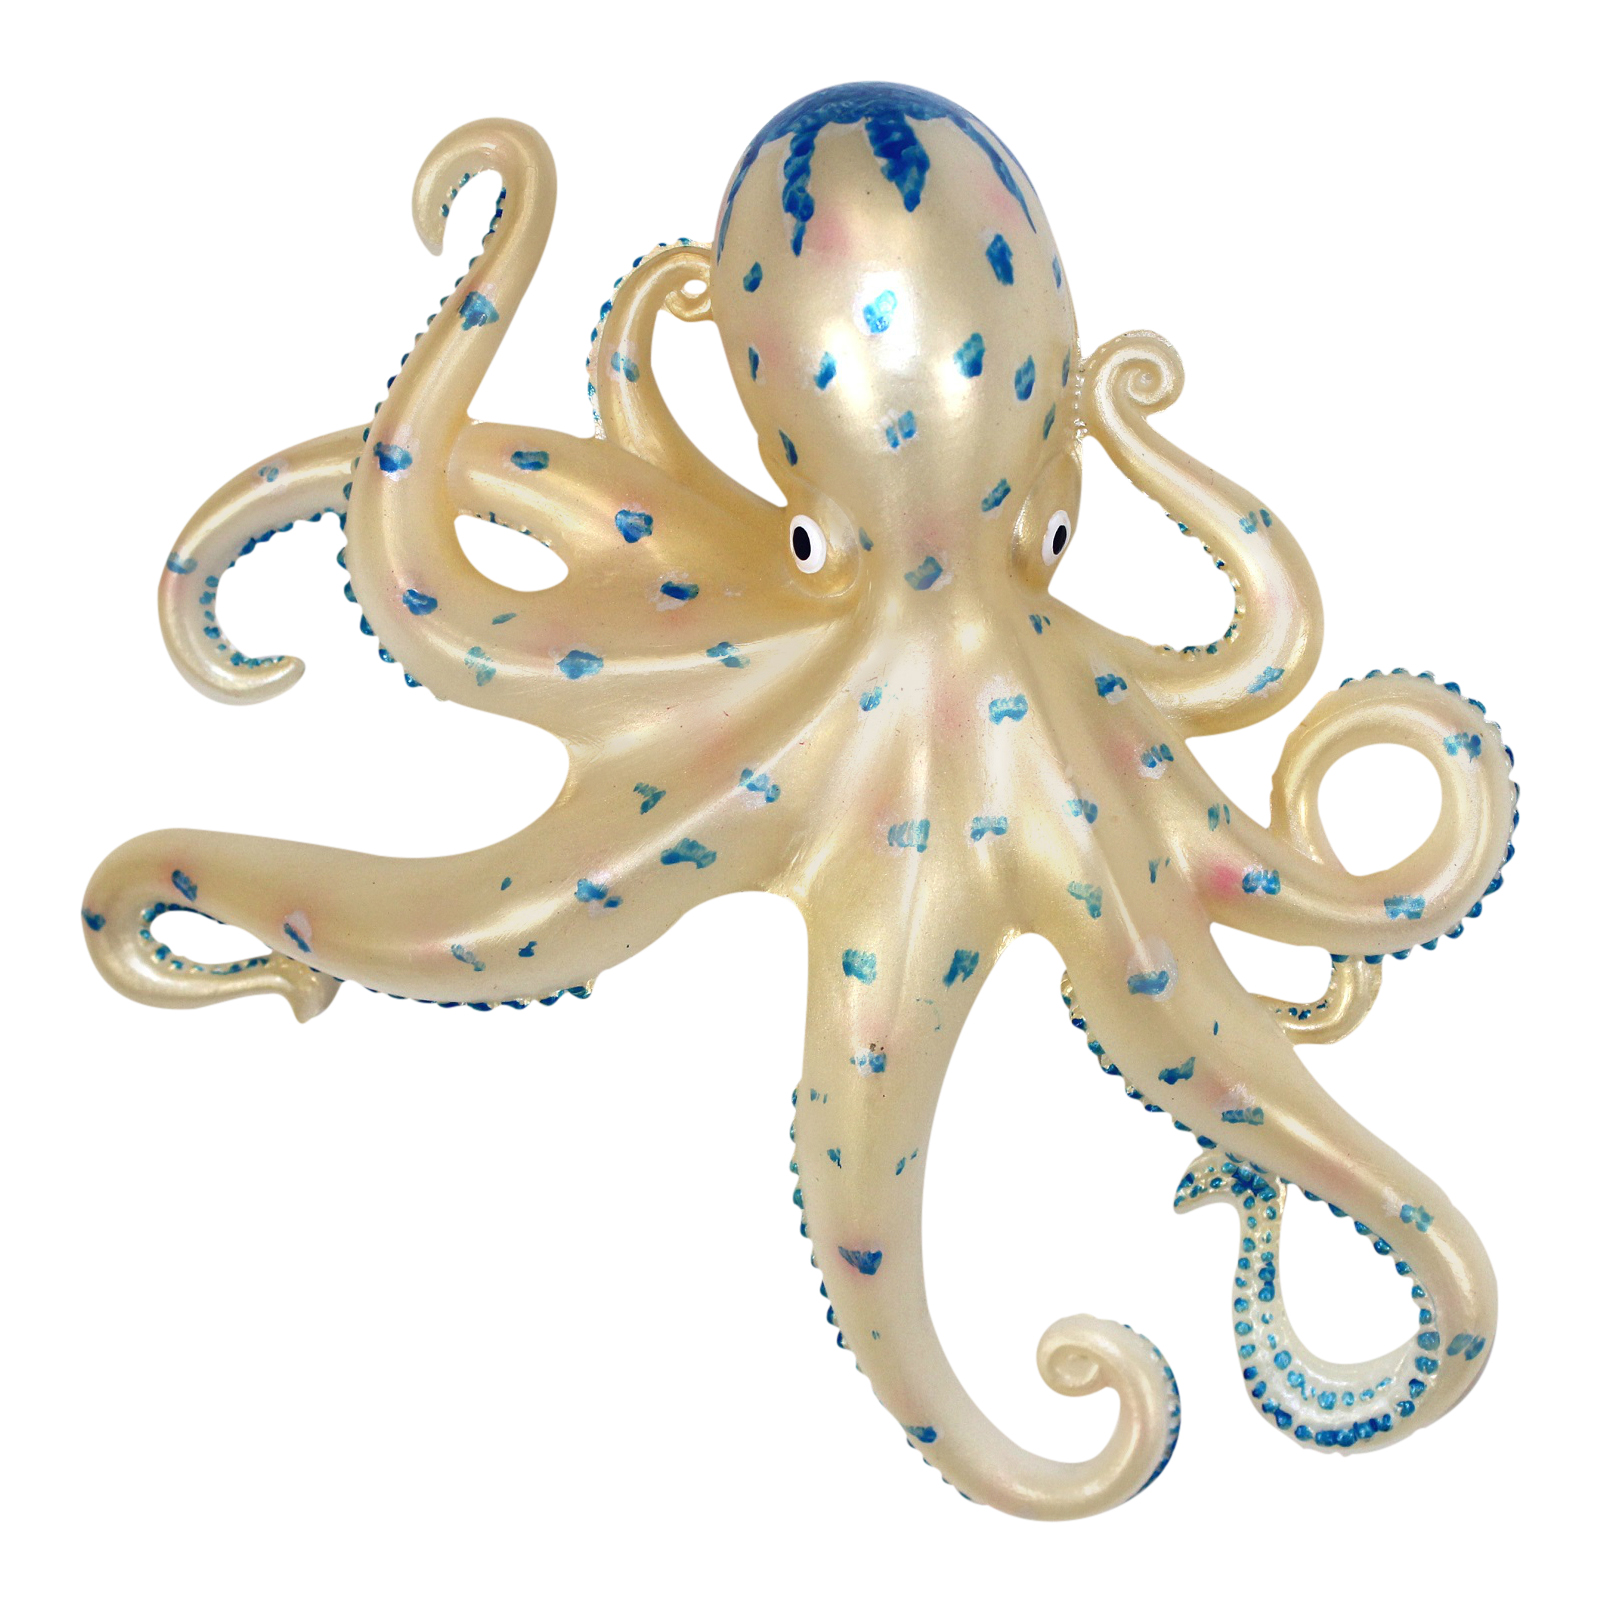 Coastal Sea Creature Apricot Octopus 9 Inch Wall Decor